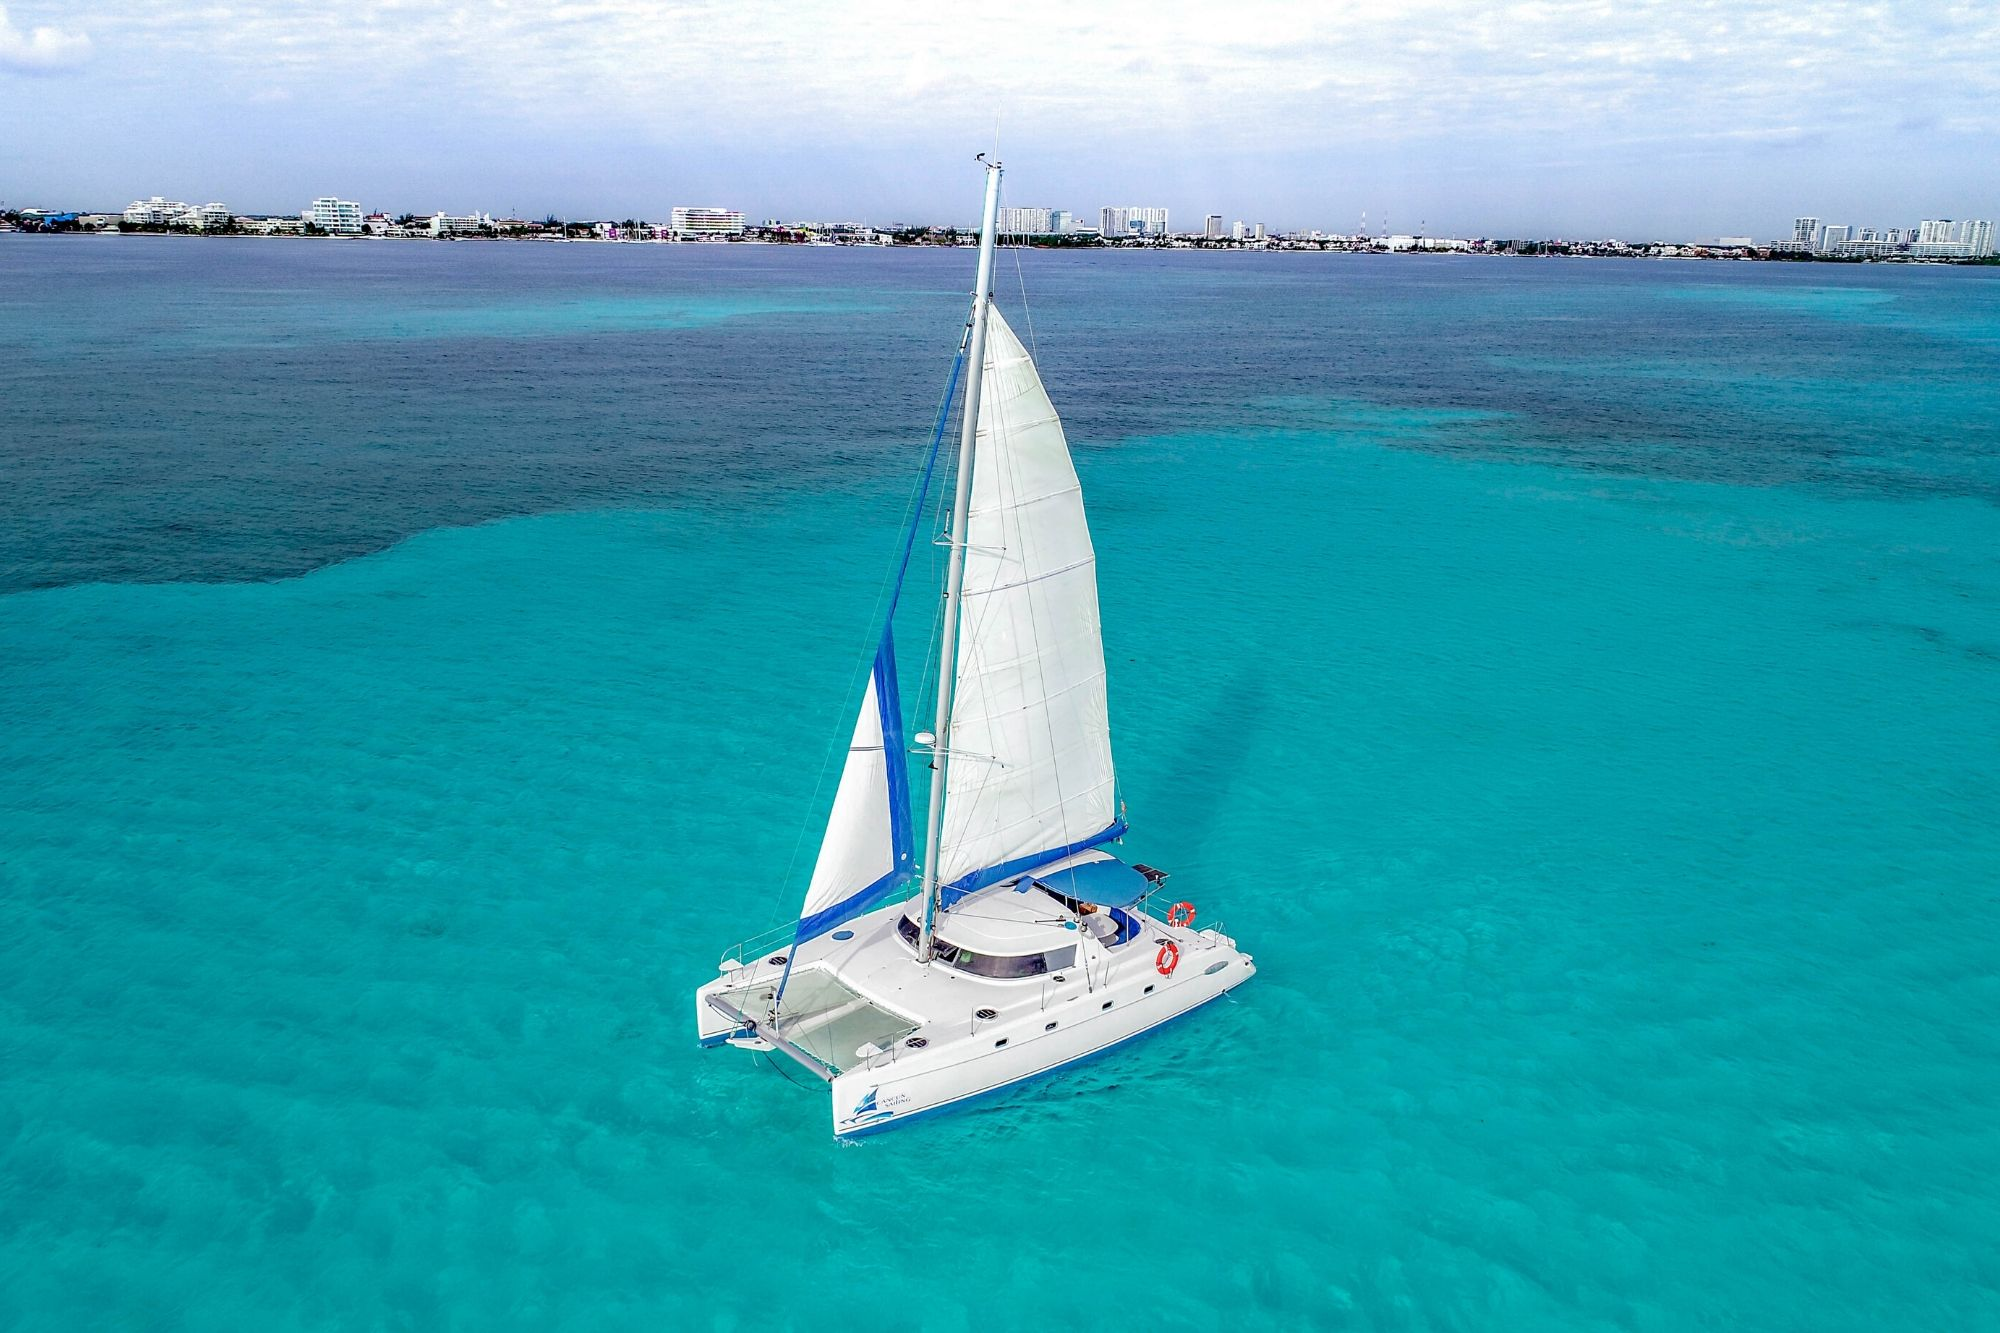 4 Vents - Isla Mujeres Catamaran Tour - Cancun Sailing 5